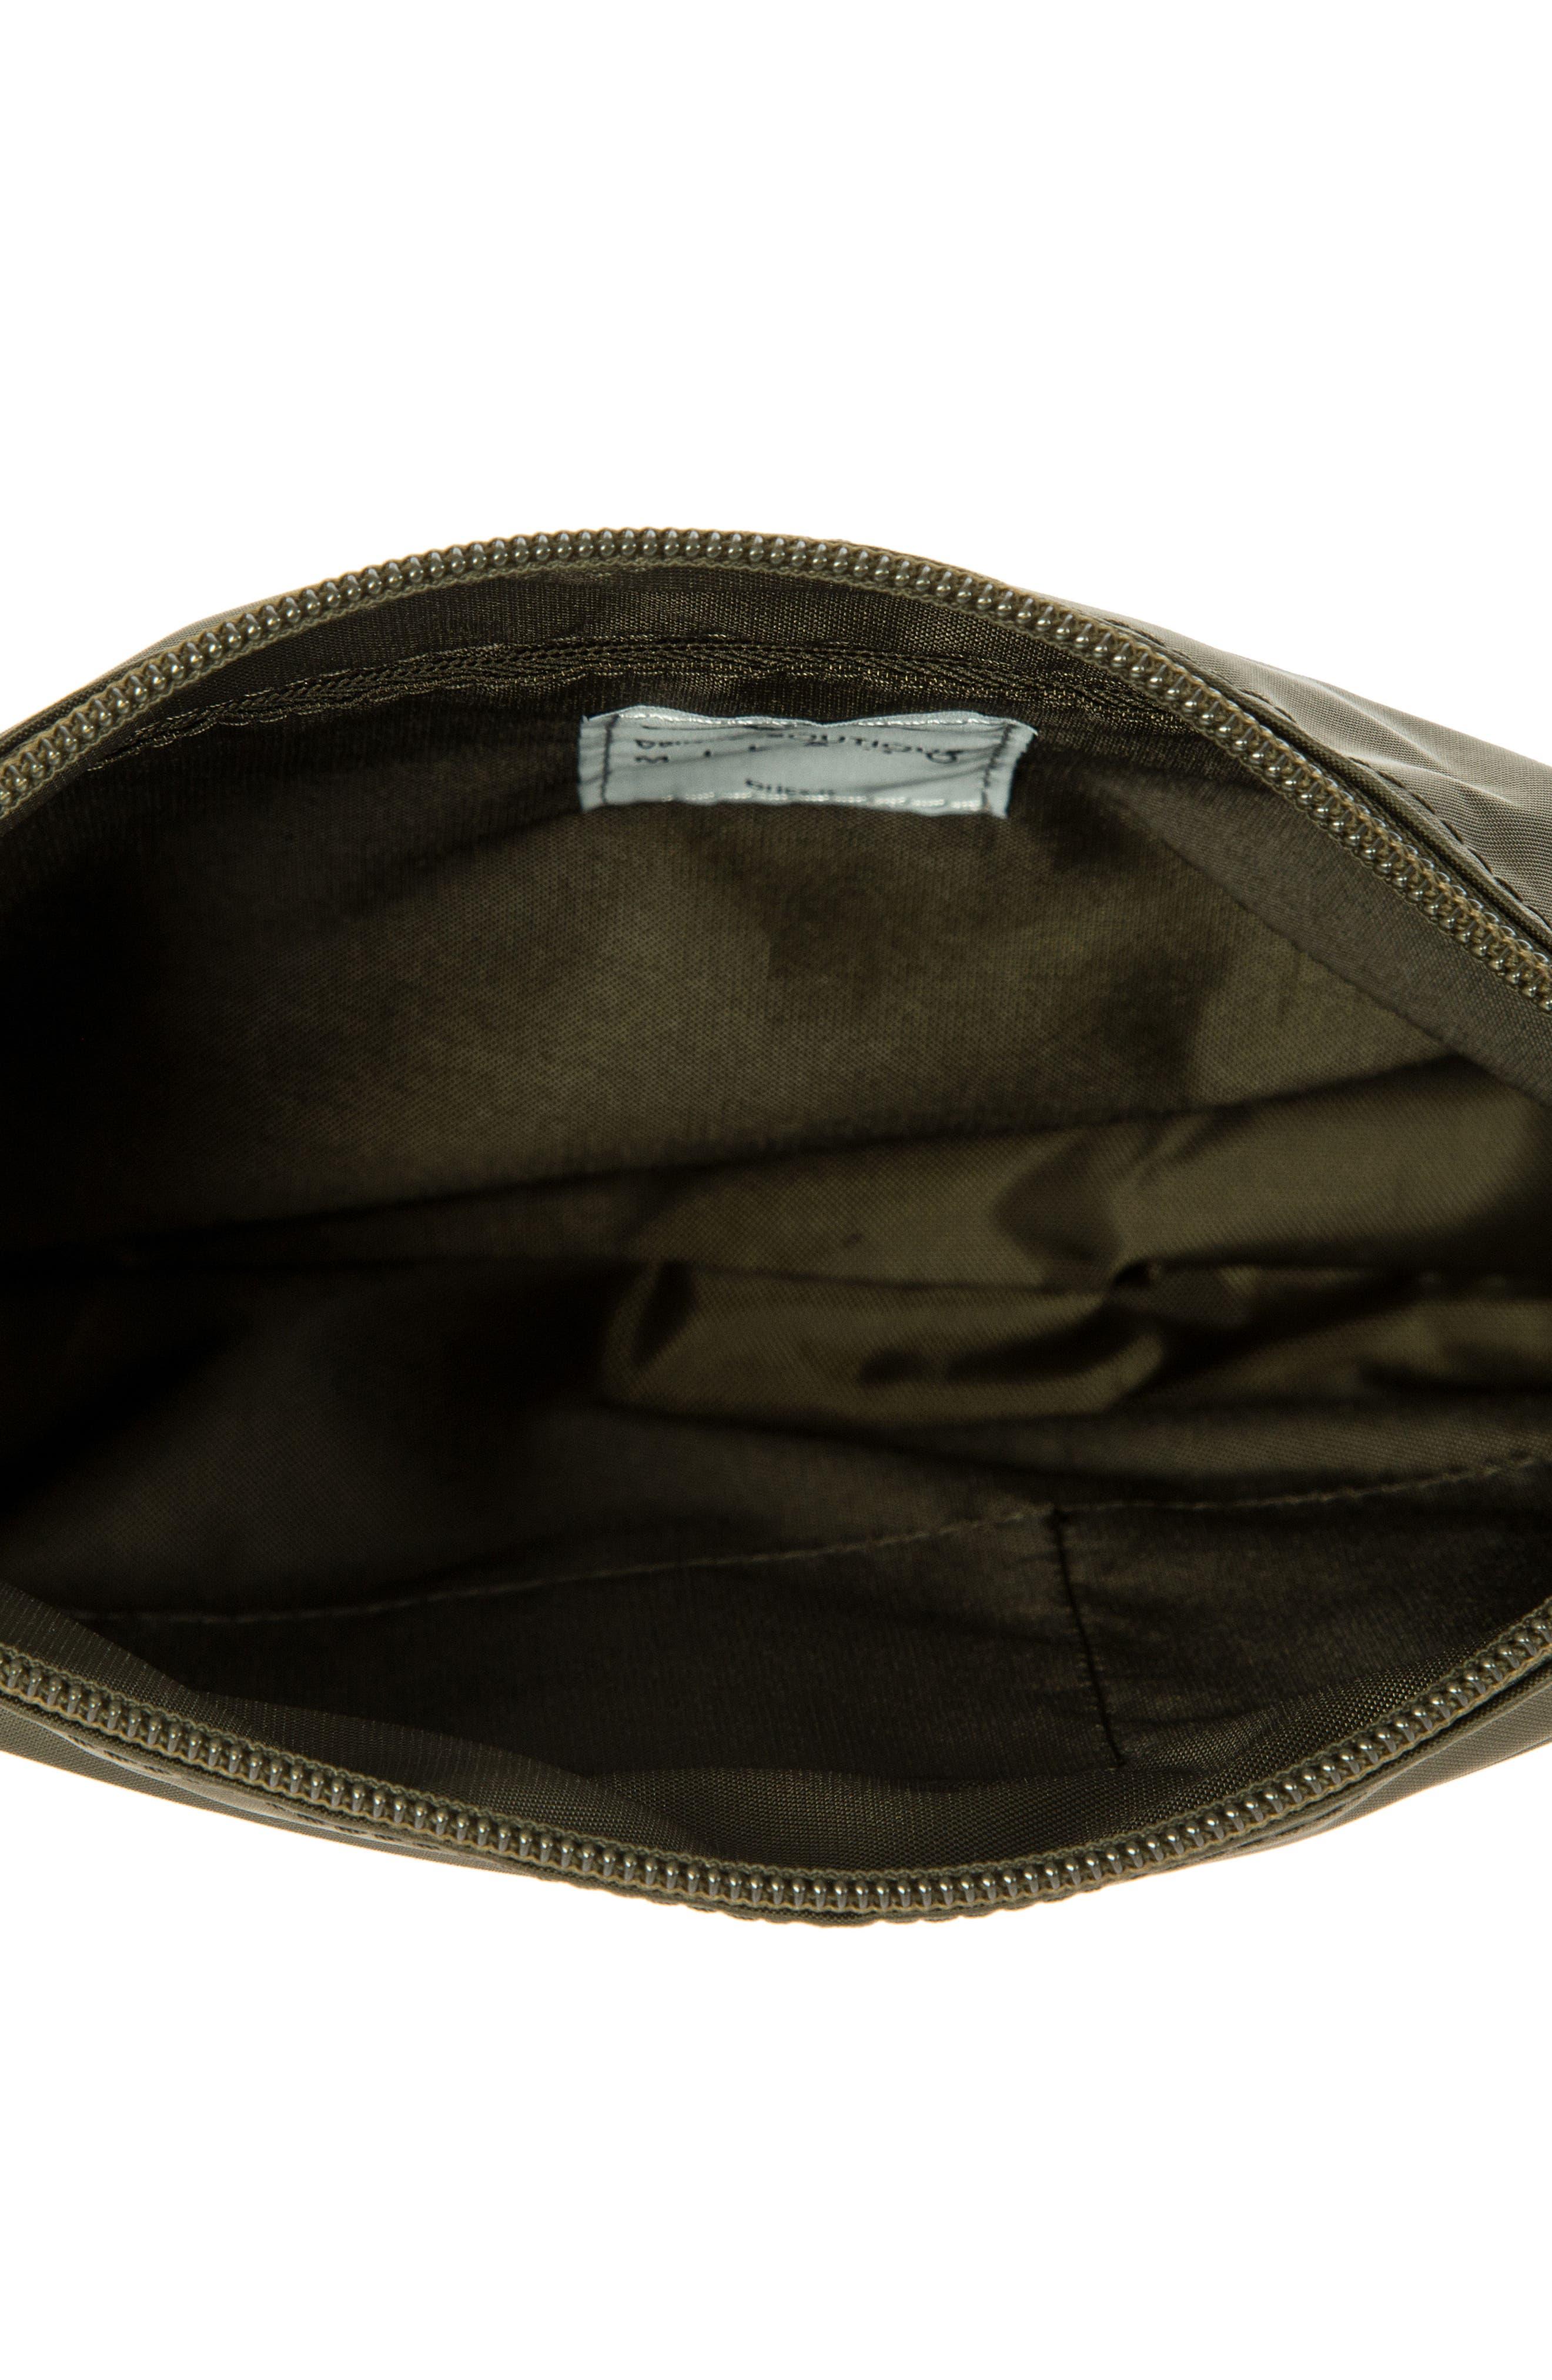 Alternate Image 3  - Bric's X-Bag Urban Crossbody Bag